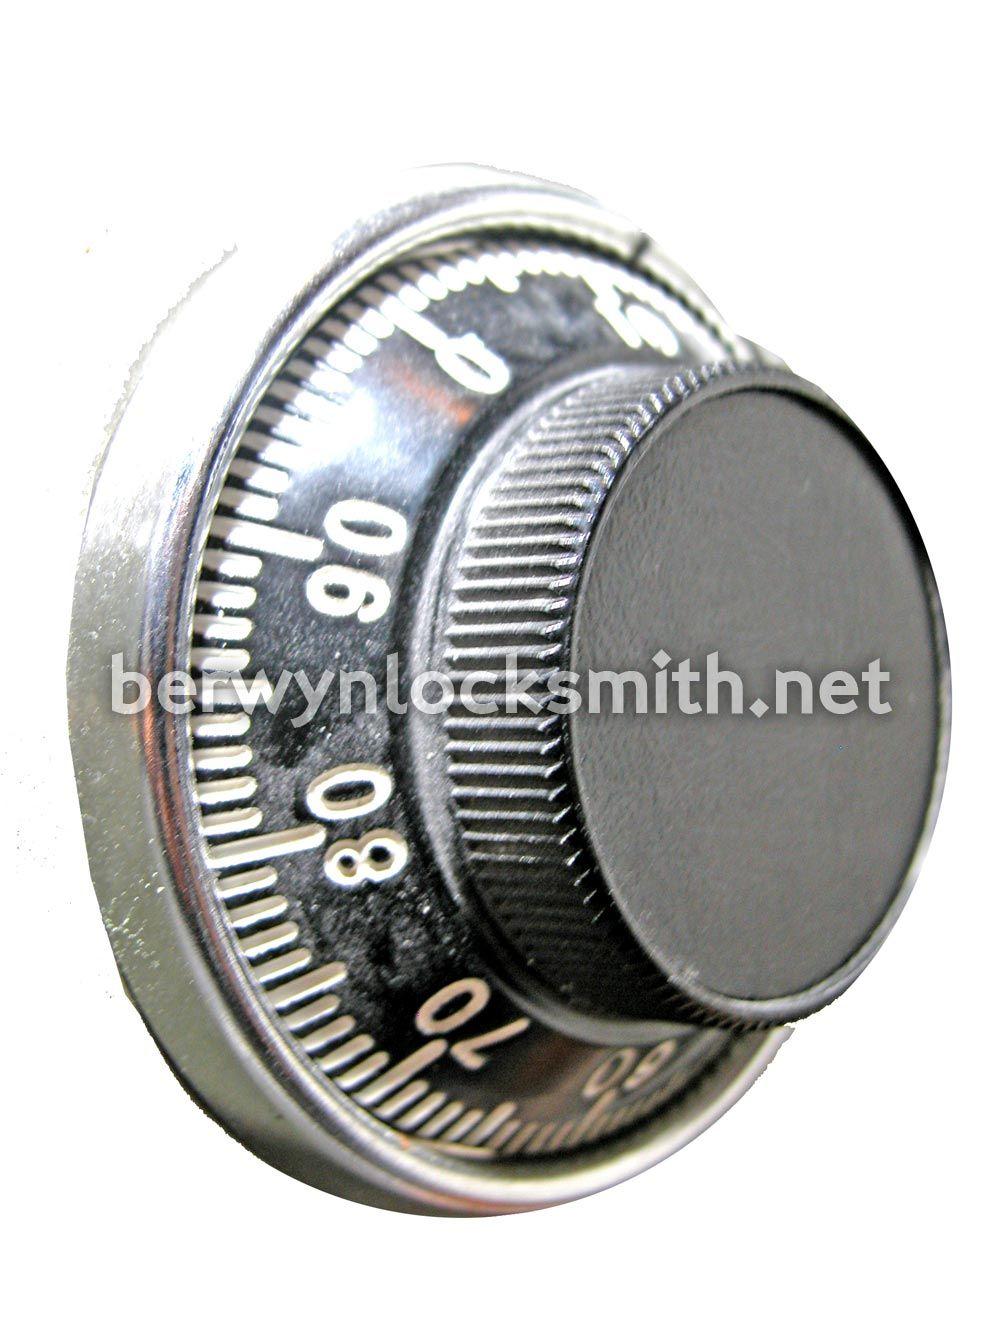 Pin by Berwyn MobileLocksmith MobileLocksmith on Berwyn